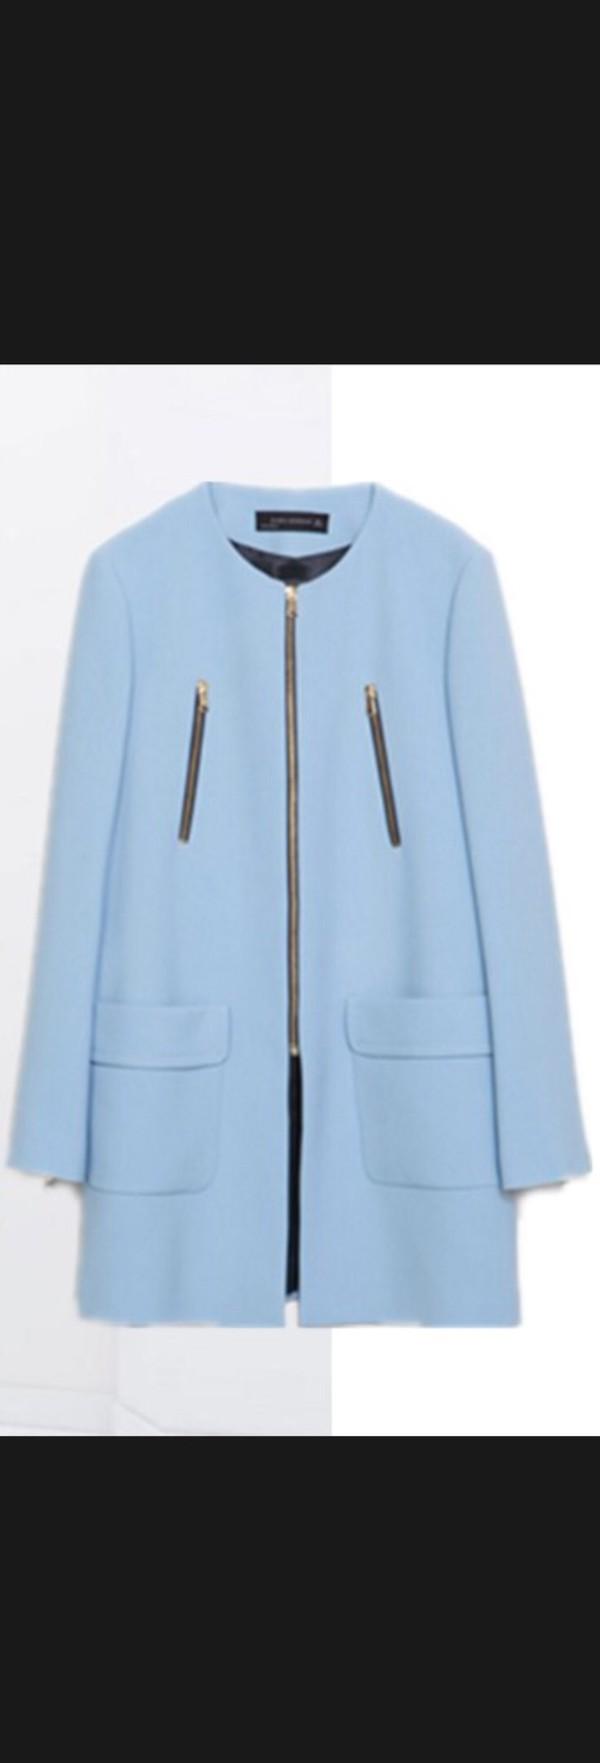 Aliexpress Com Buy 2014 New Autumn Winter Za Light Blue